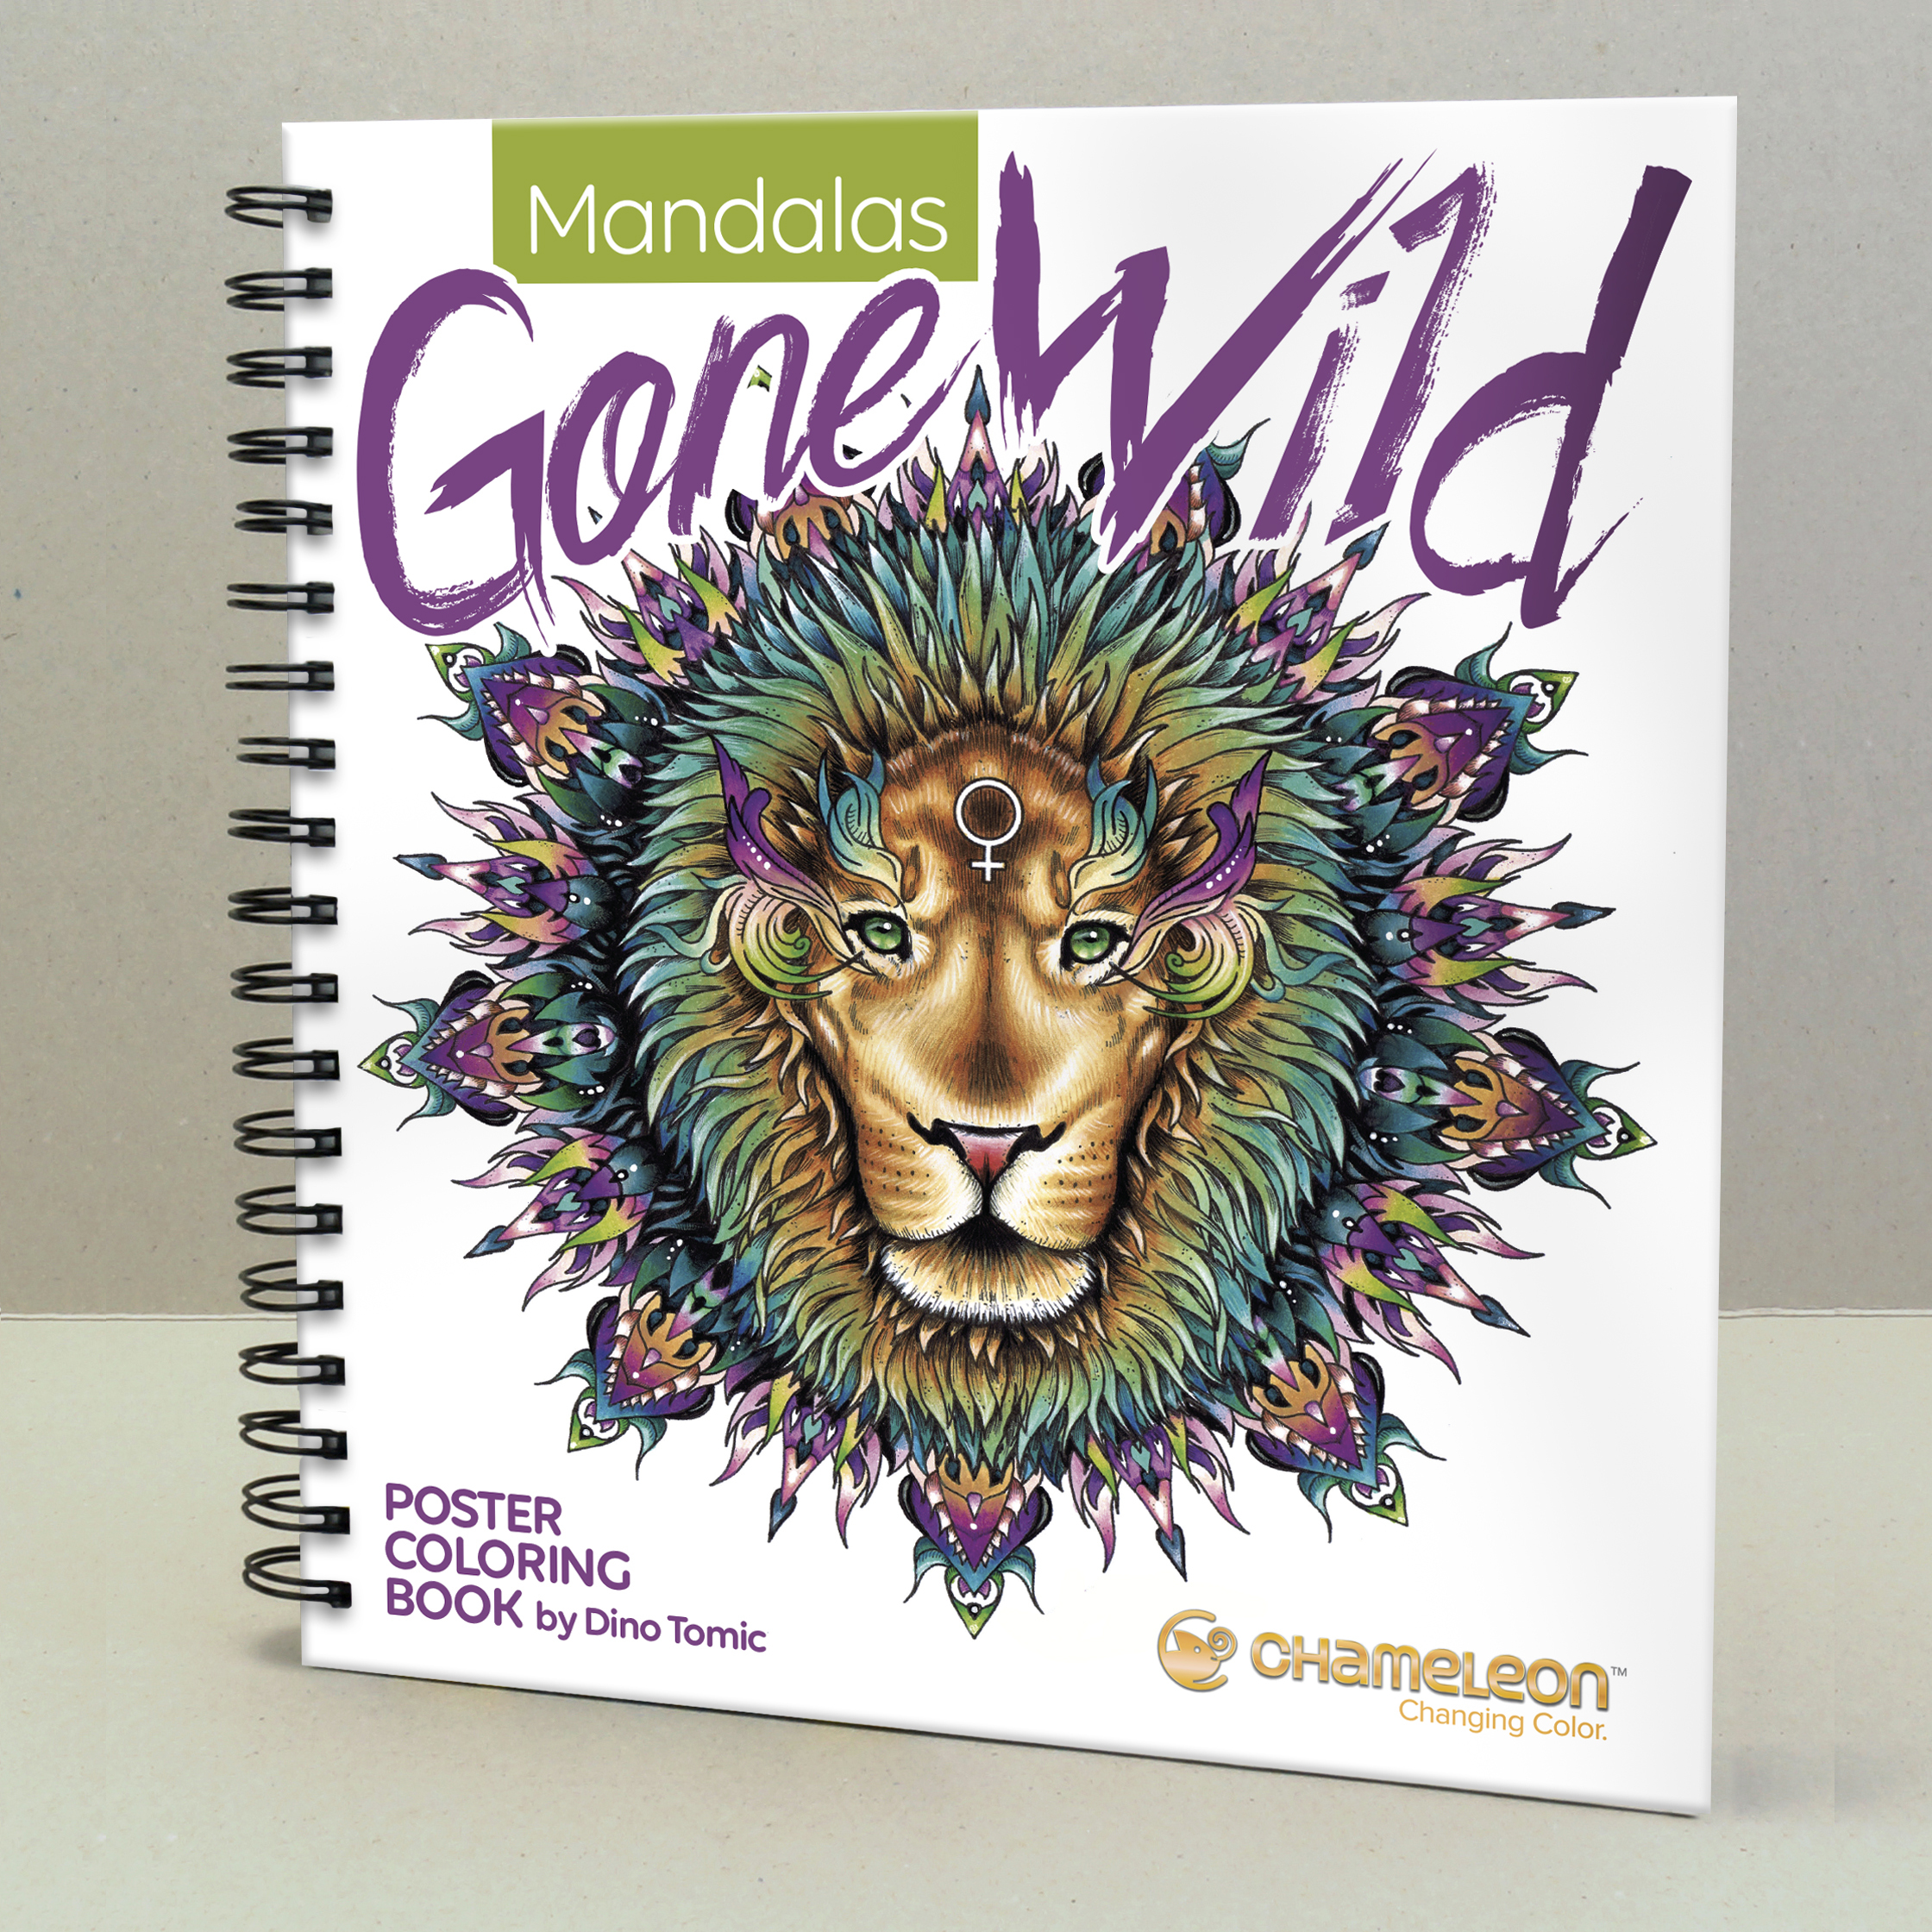 Chameleon Pen Mandalas Gone Wild Poster Coloring Book (カメレオンペン マンダラゴーンワイルド カラーリングブック)